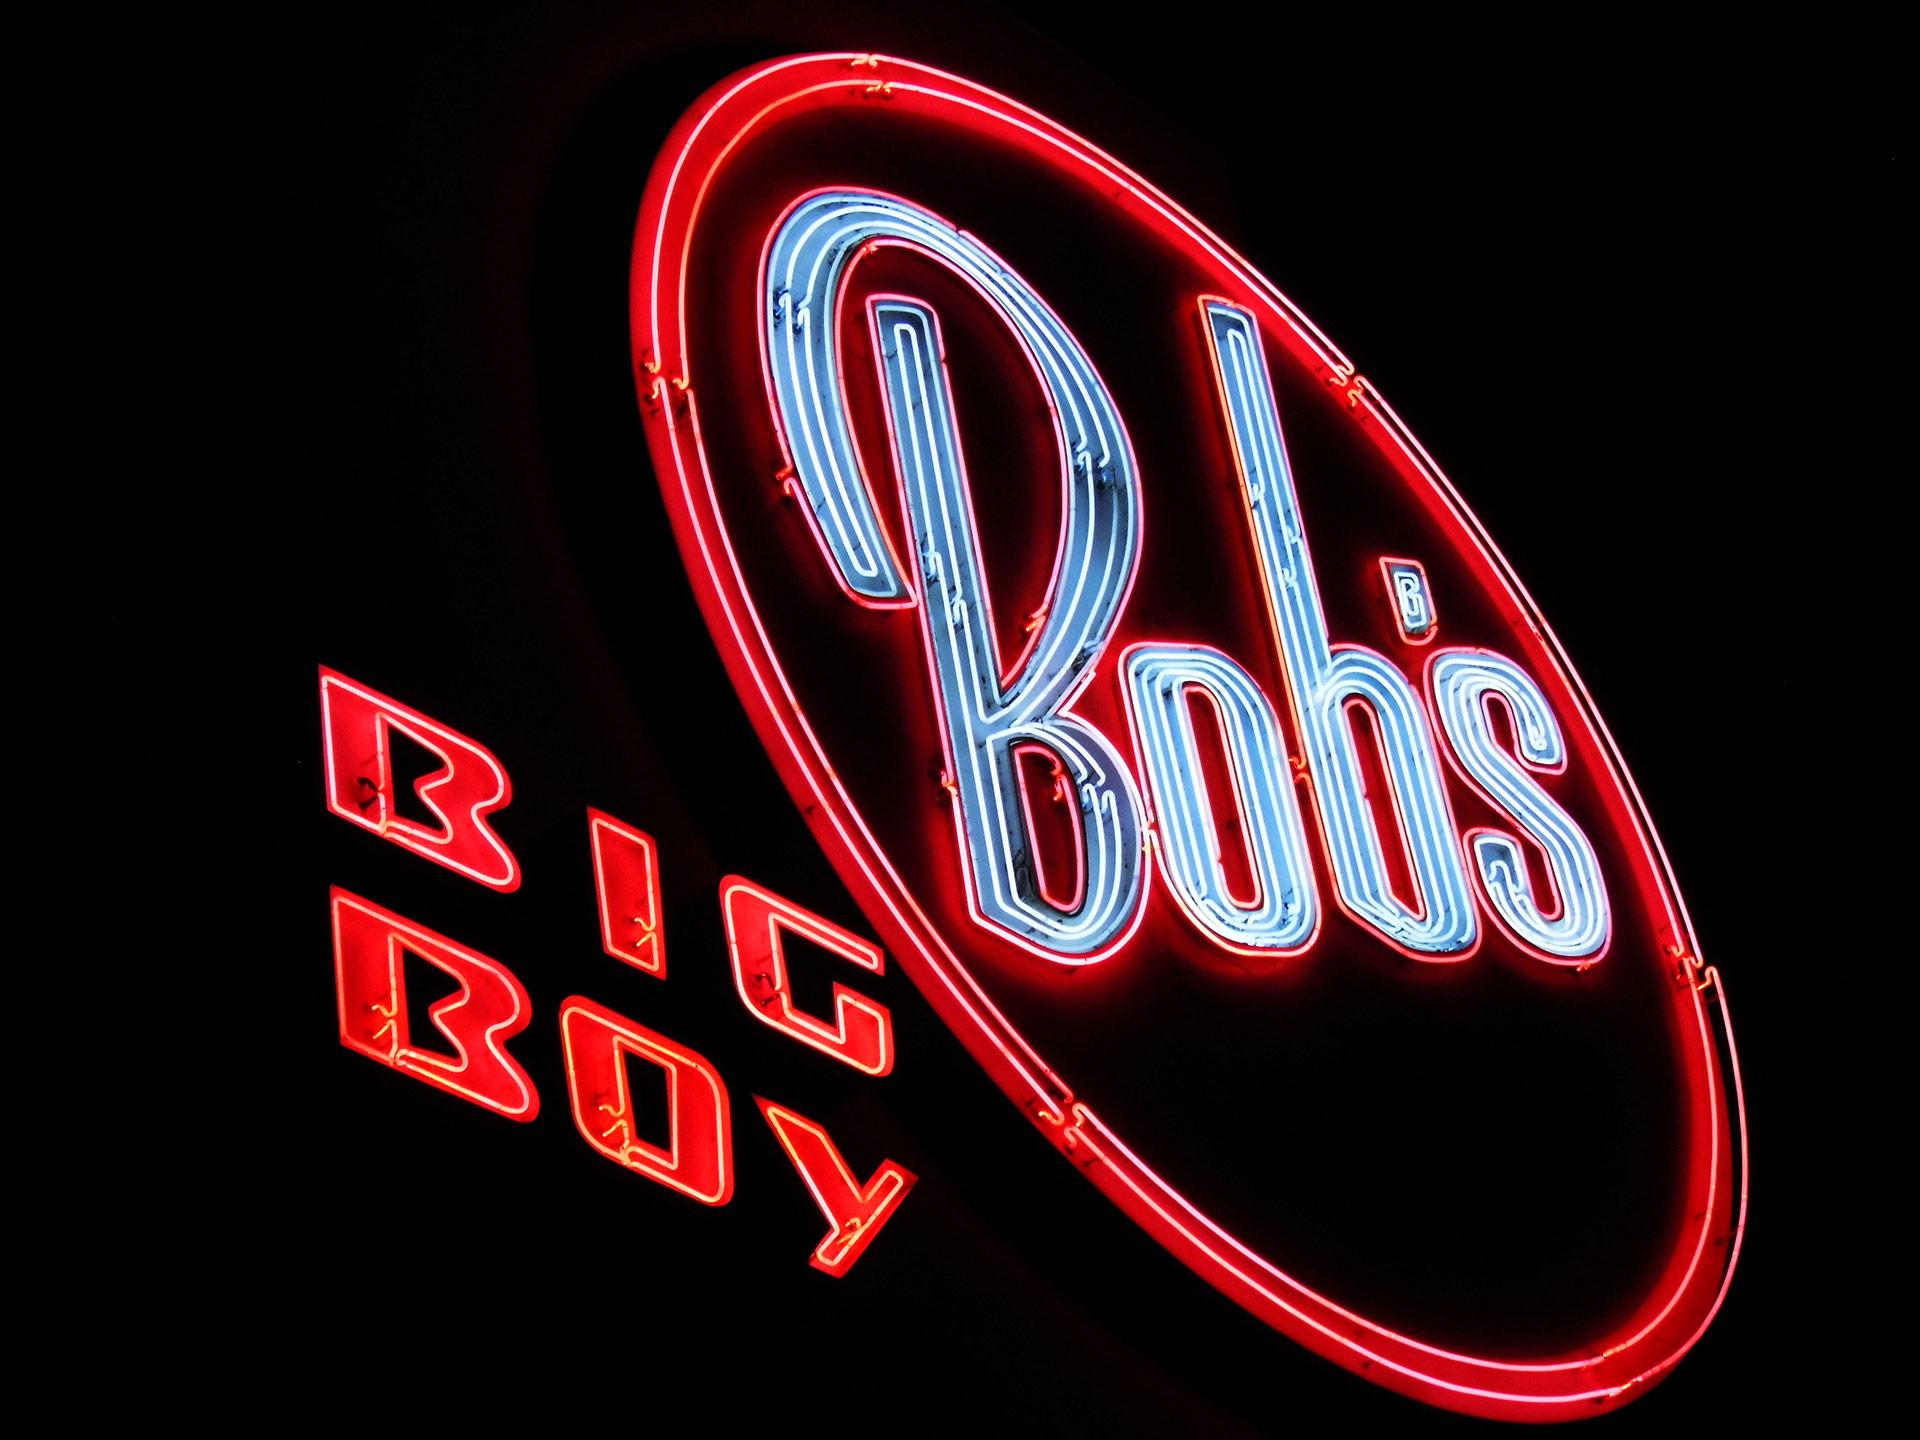 Bob's Big Boyin Toluca Lake | Sandi Hemmerlein